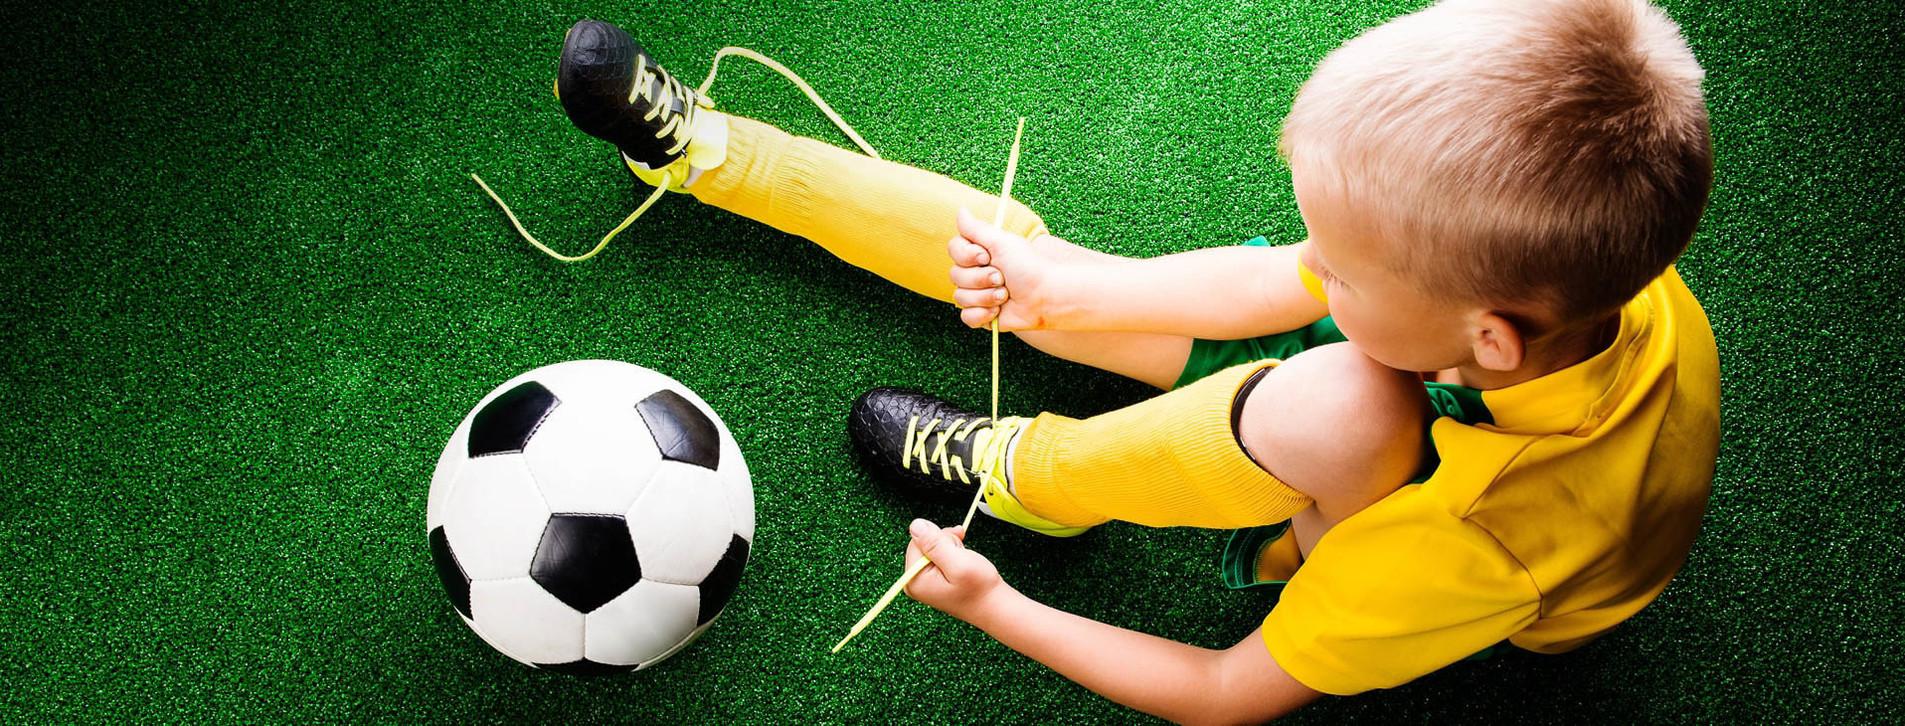 Фото 1 - Детская школа футбола